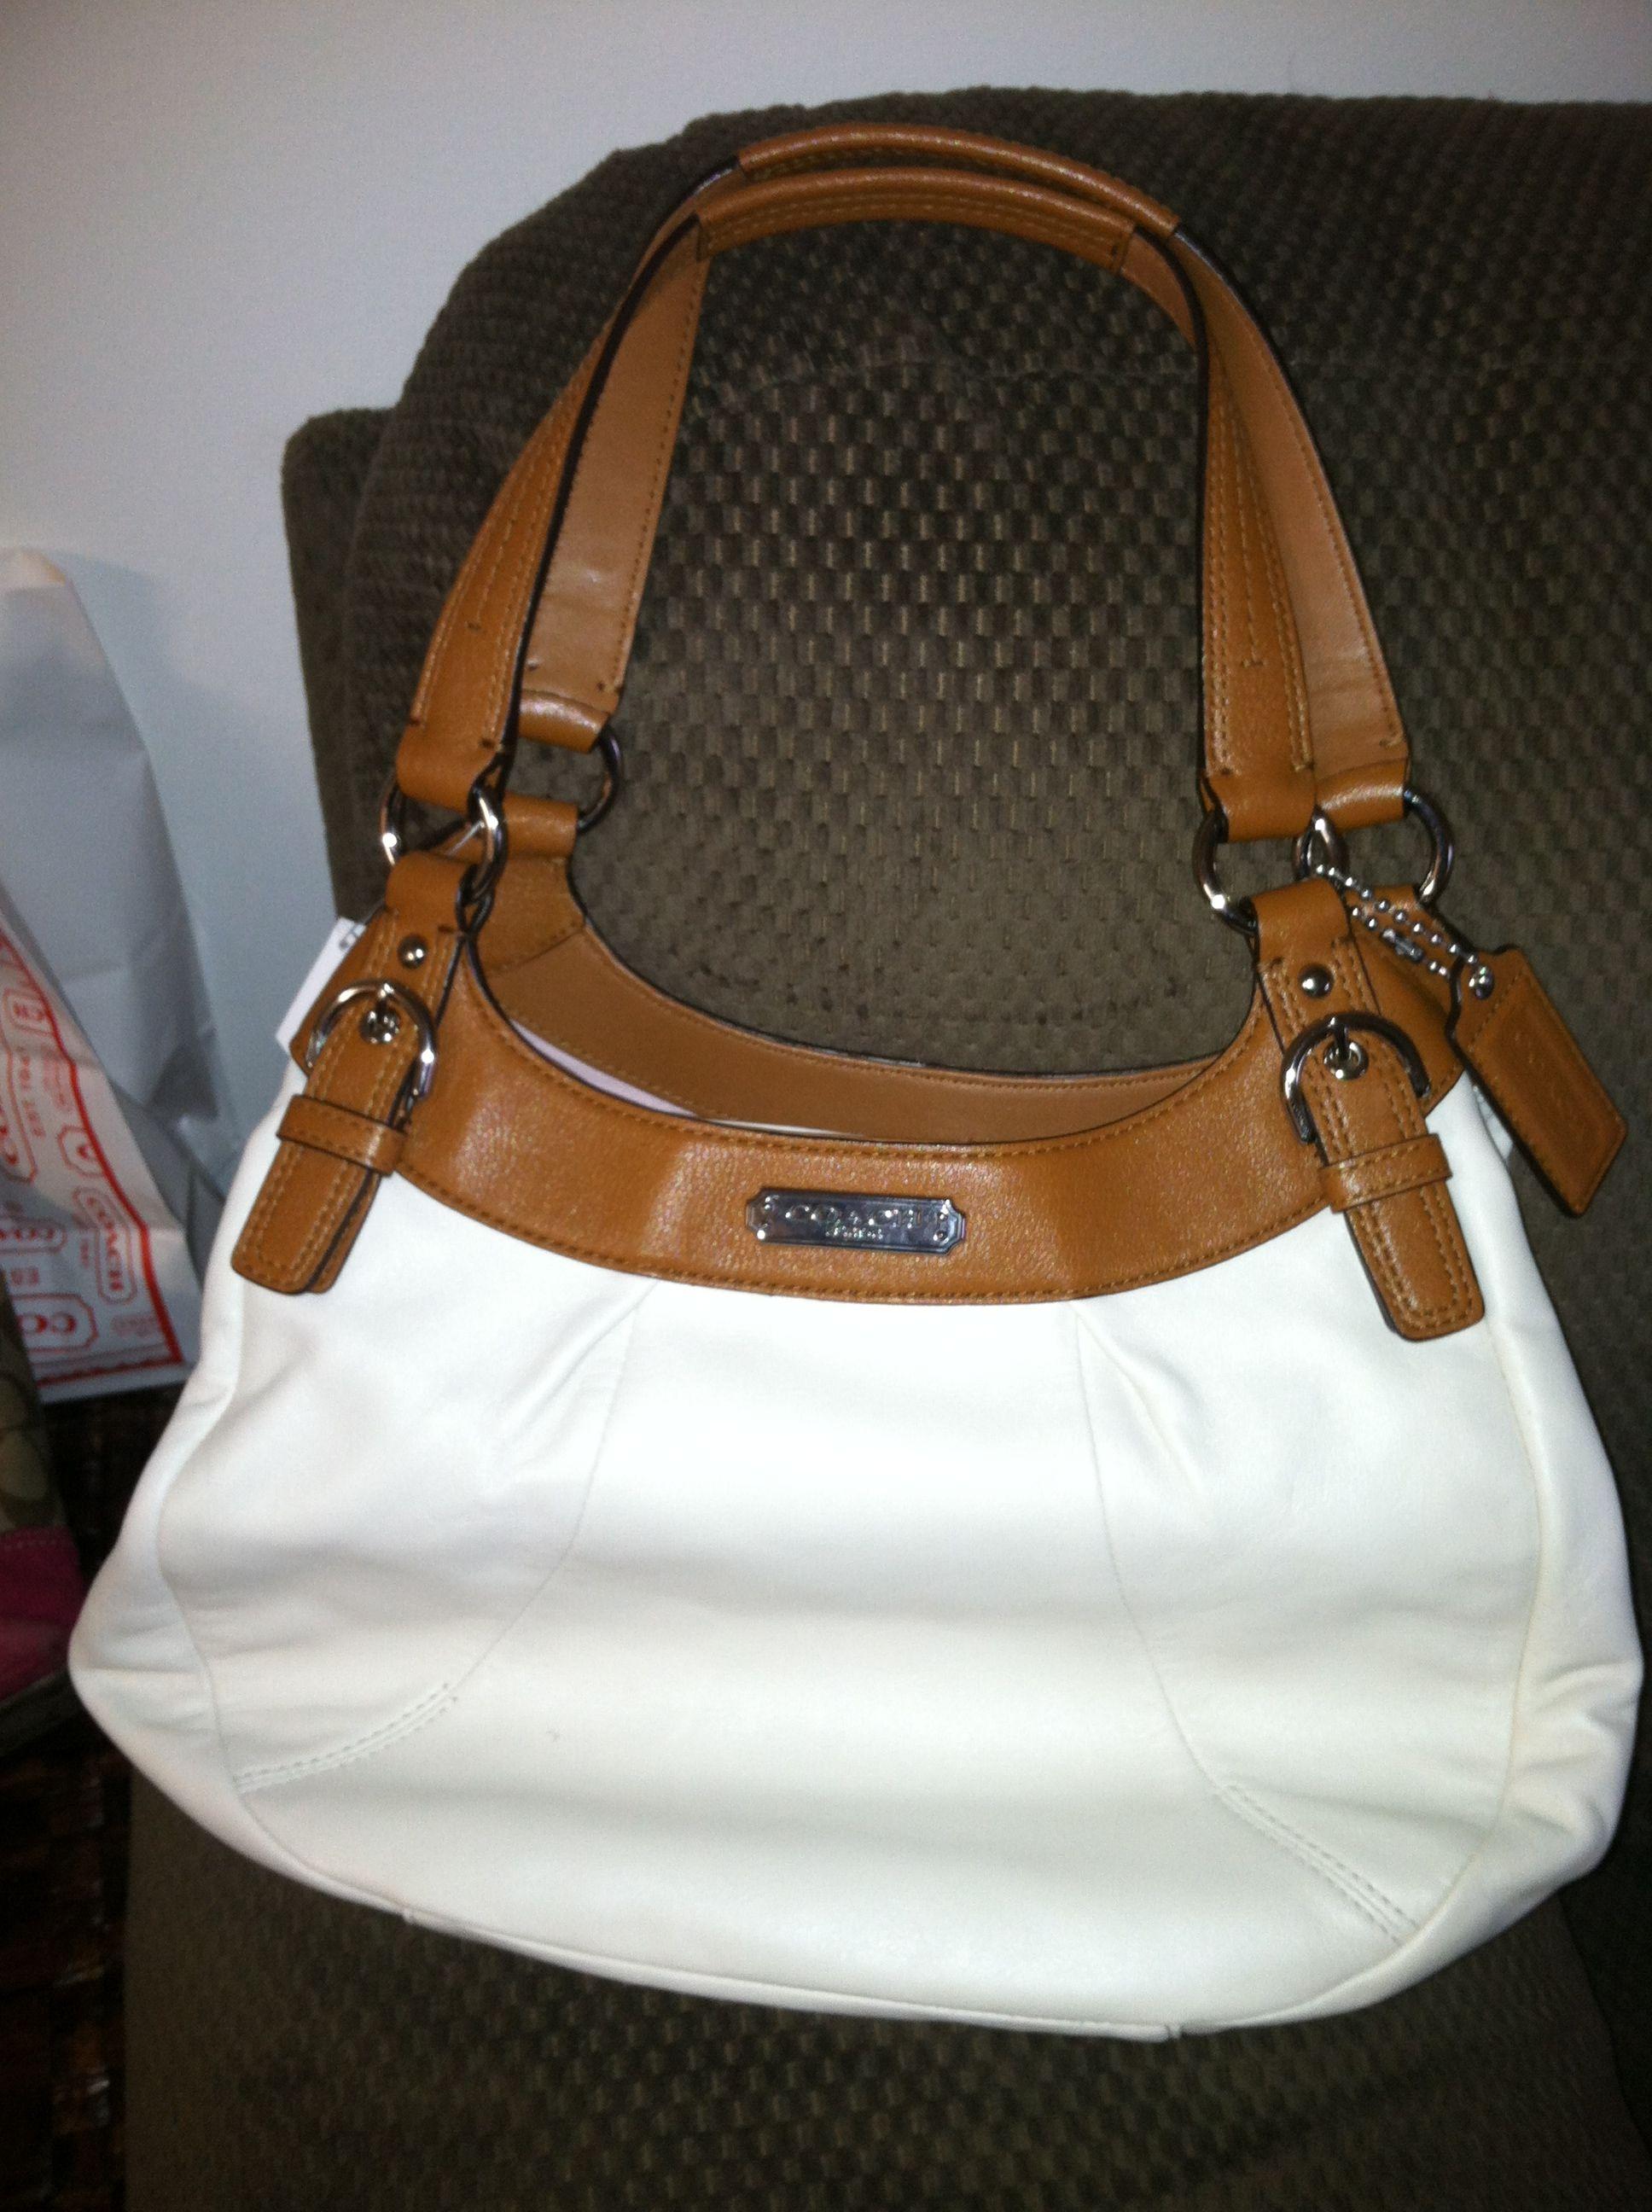 New Coach Purse Whole Knockoff Designer Handbags